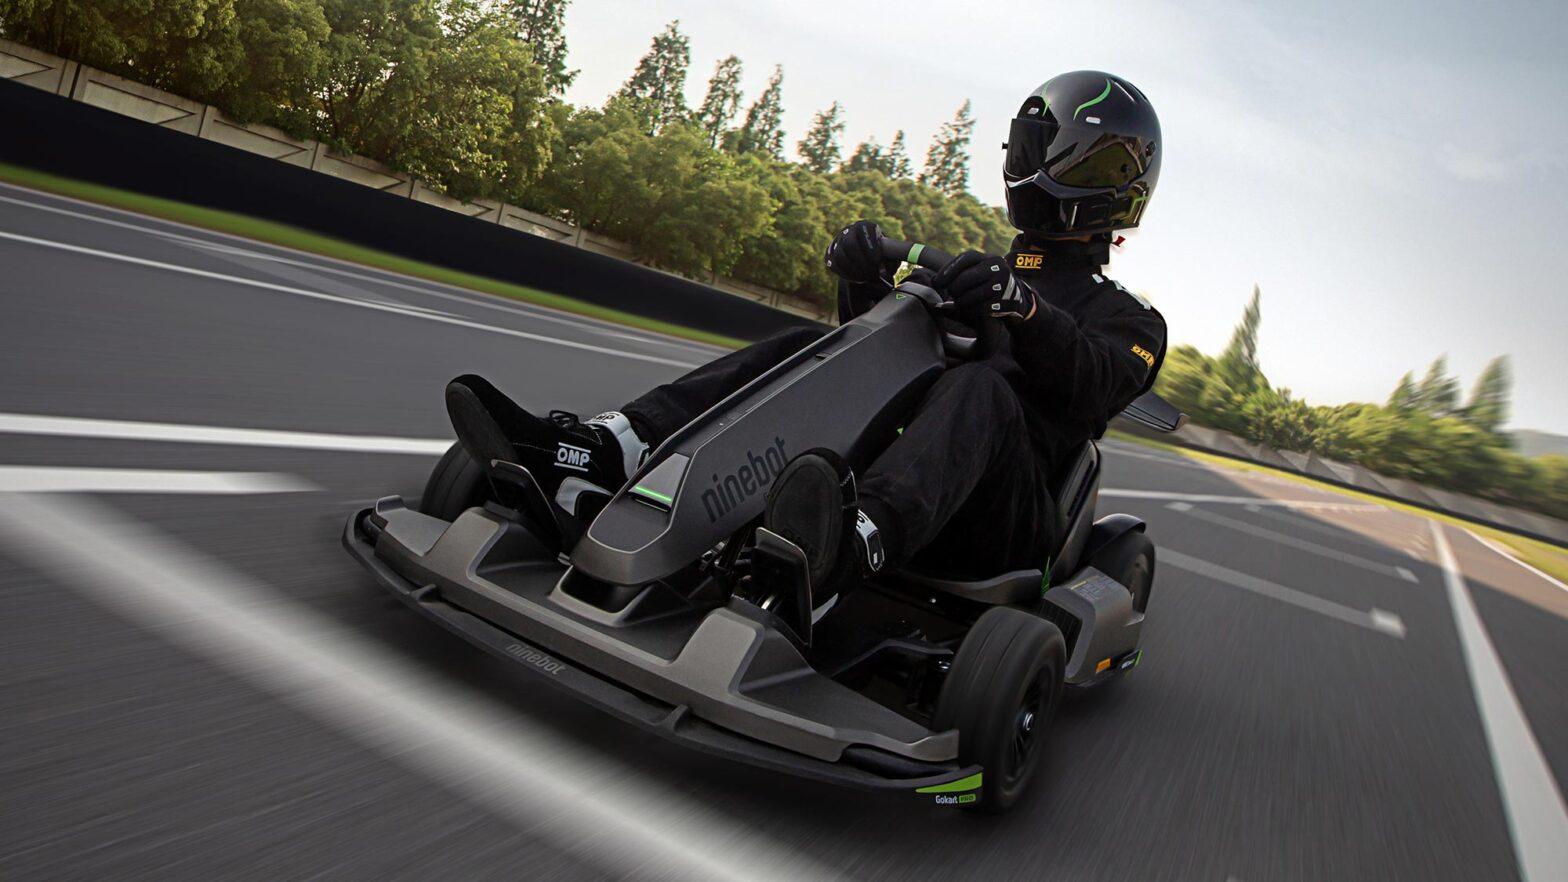 Ninebot Gokart PRO Electric Go-Kart